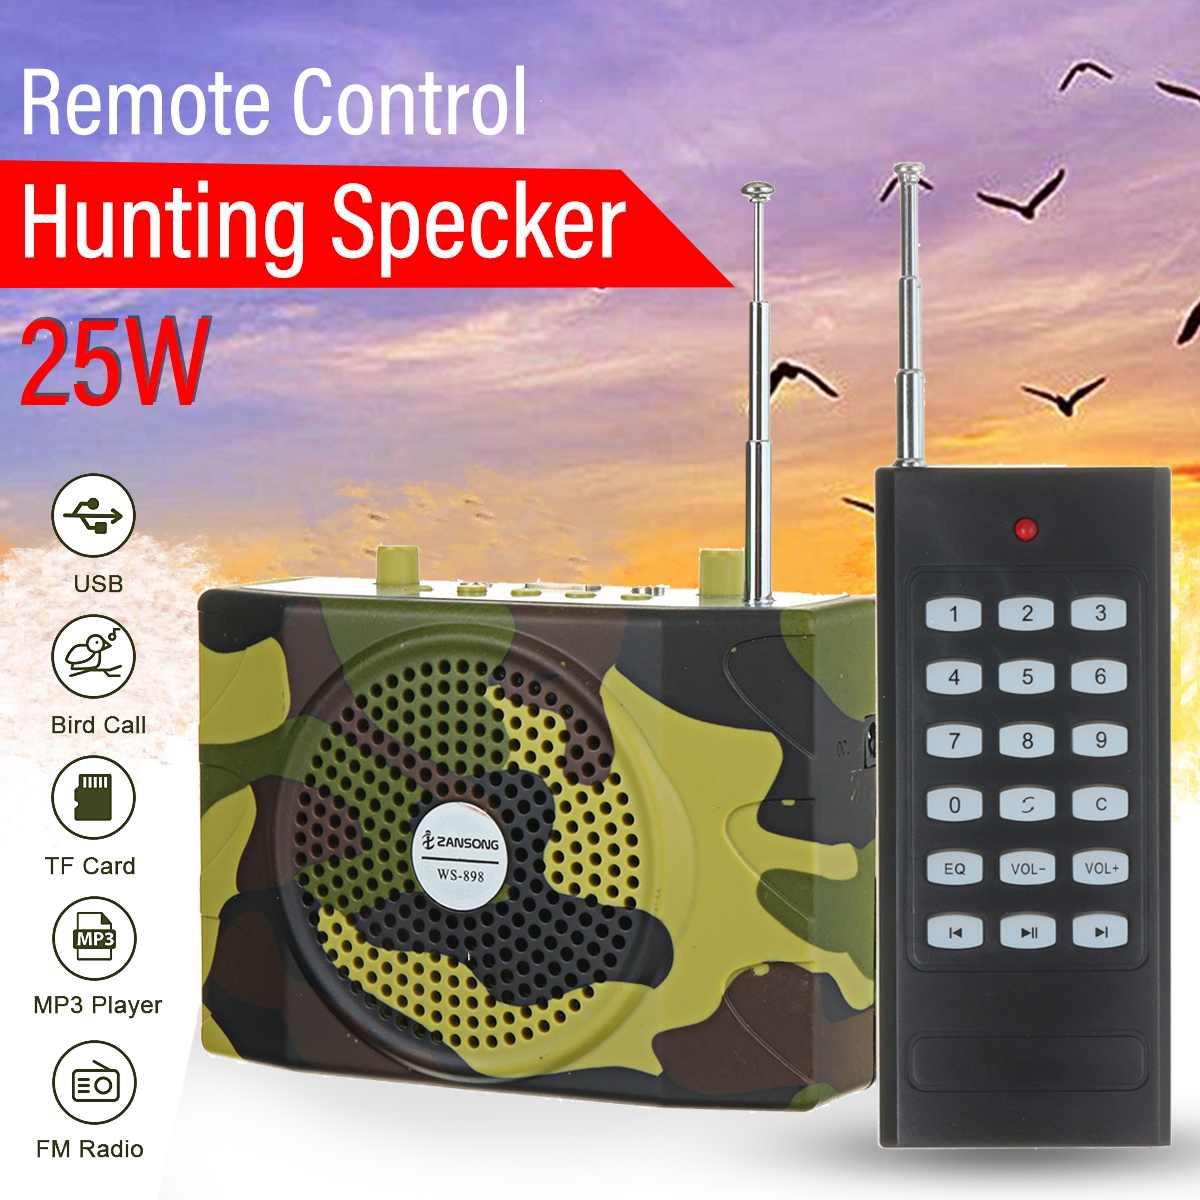 Hunting Speaker Remote Control Bird Caller Predator Sound FM Radio MP3 Player Lanyard Kit Camouflage Hunting Decoy Accessories